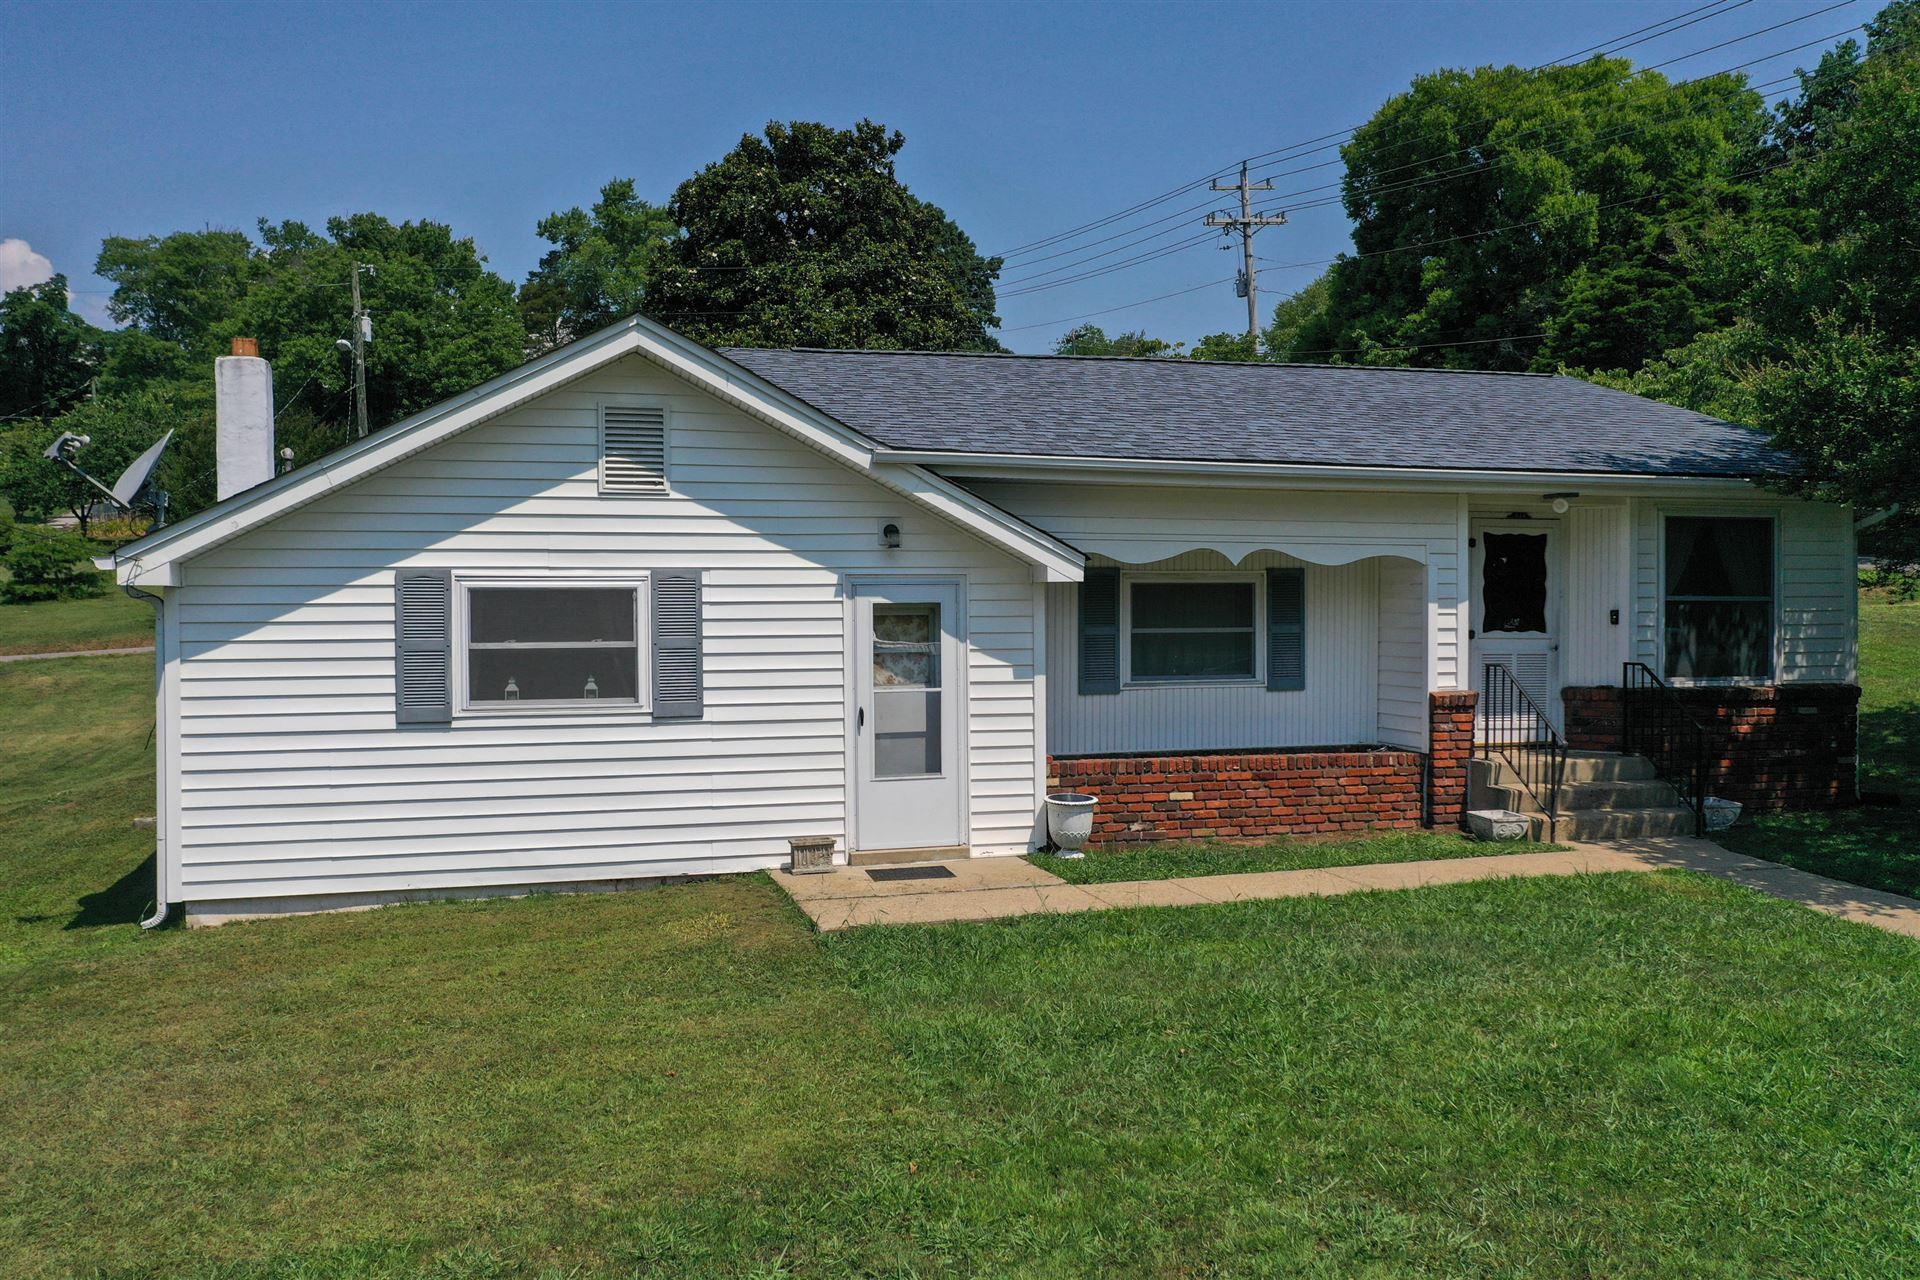 Photo of 926 Medaris St, Clinton, TN 37716 (MLS # 1159787)